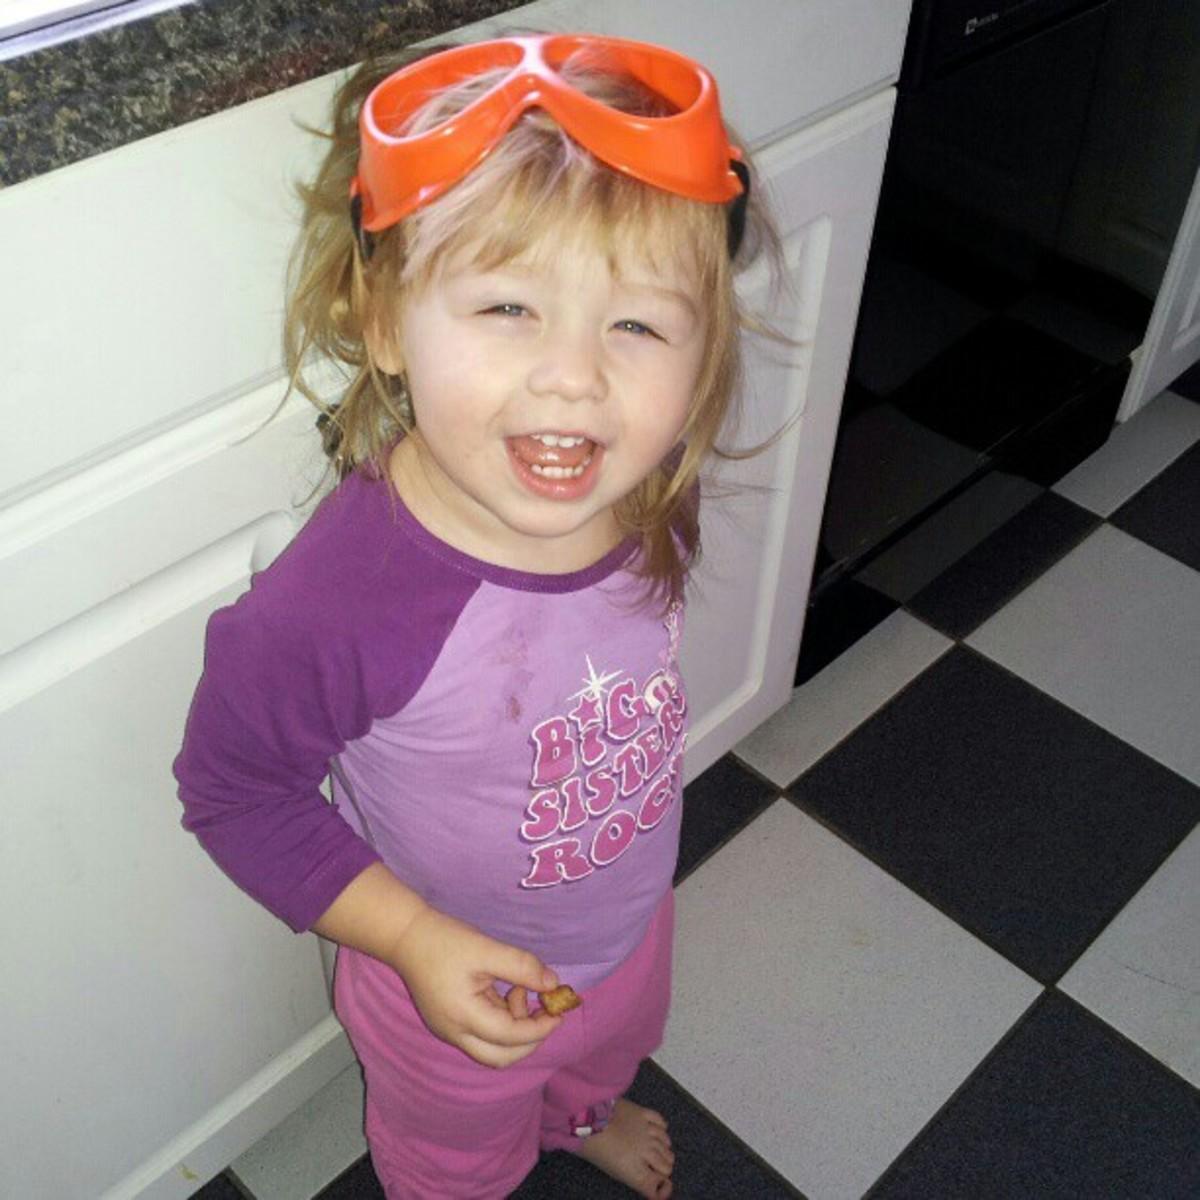 My little troublemaker